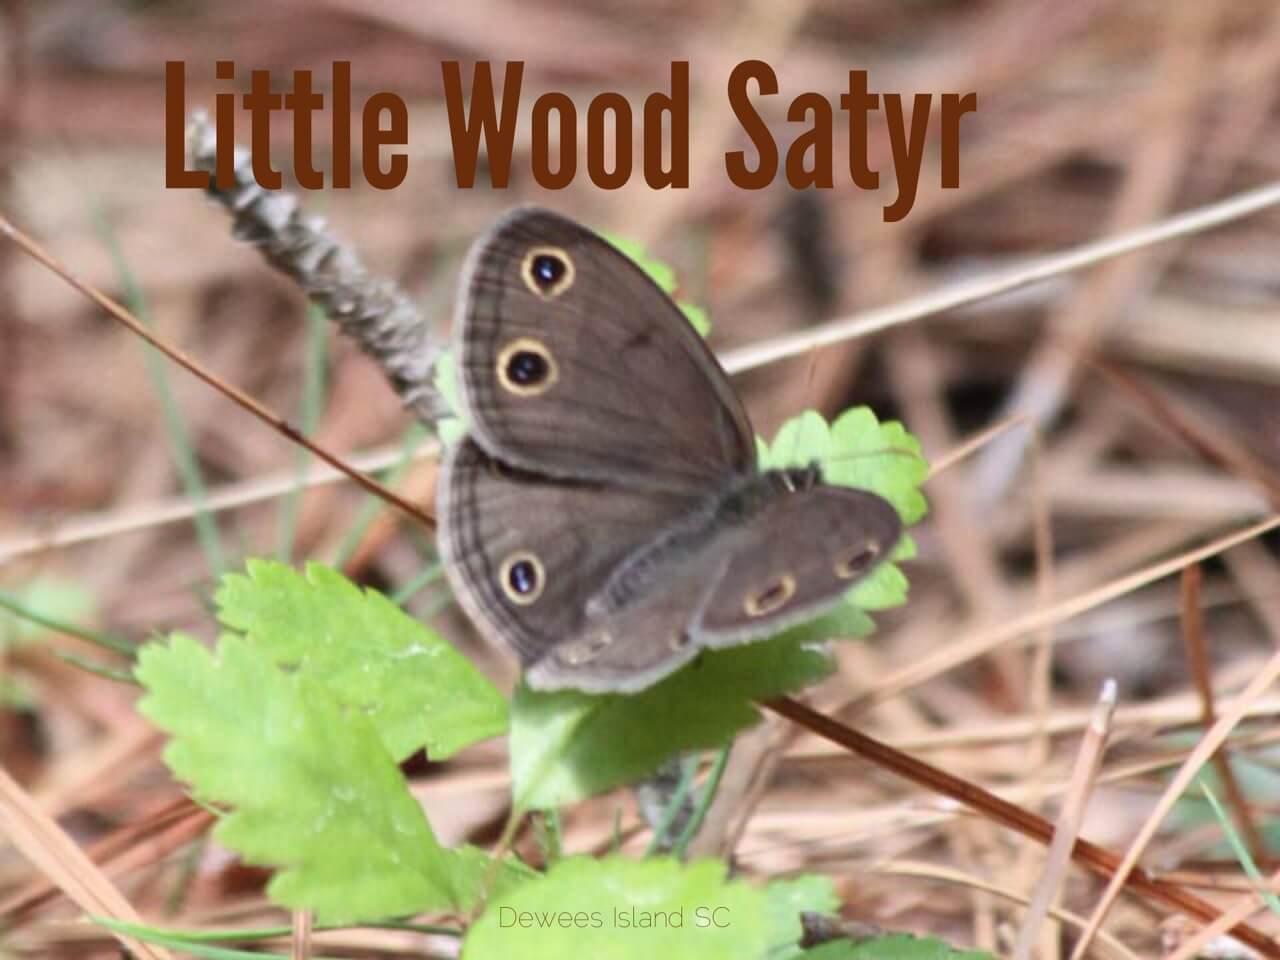 woodsatyr